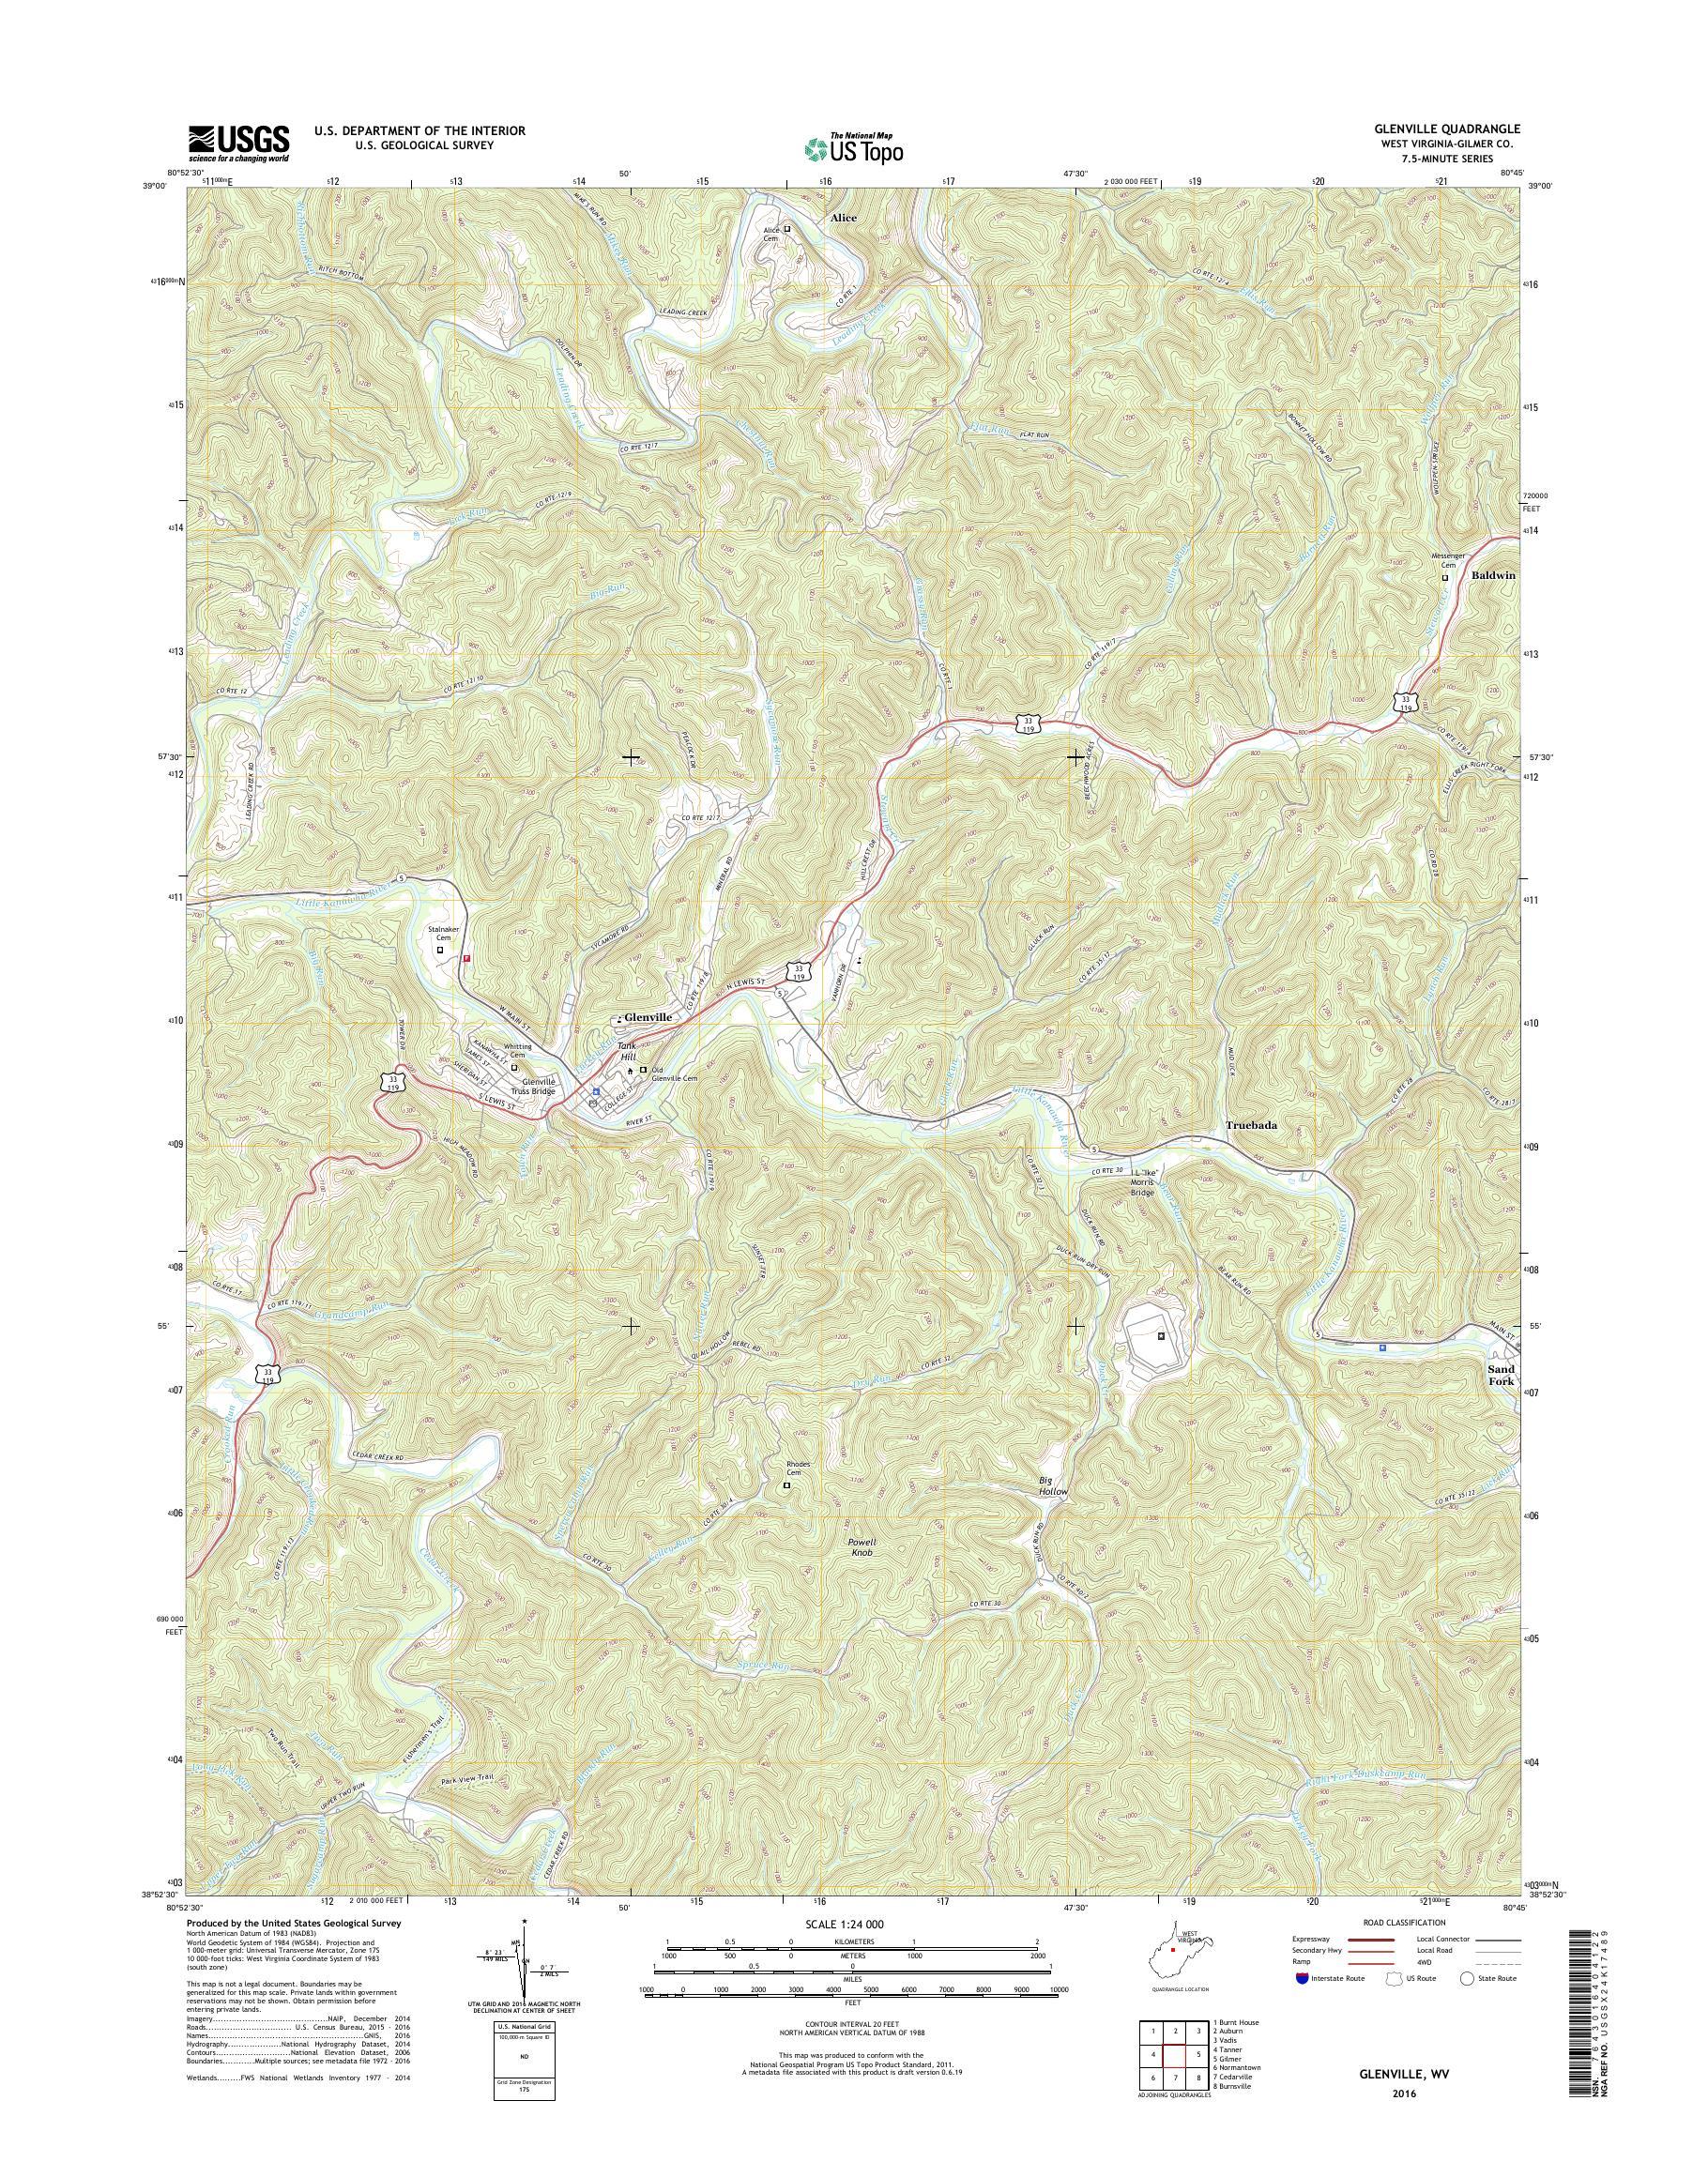 Mytopo Glenville West Virginia Usgs Quad Topo Map